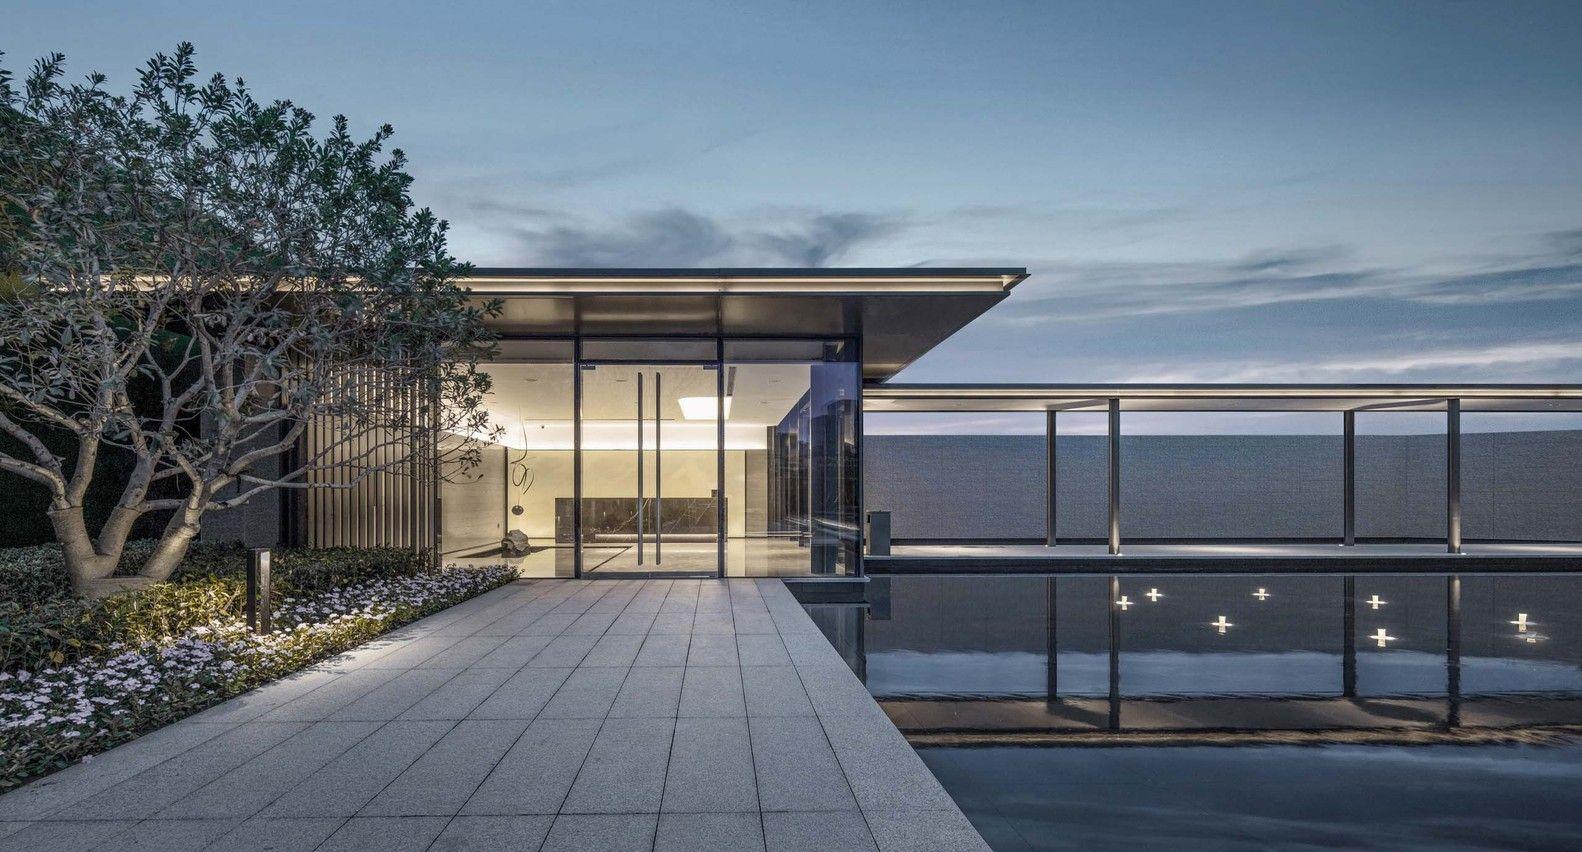 Gallery Of Super Fluid Artistic Life House Gad Line Studio 11 Studio House Photo Studio